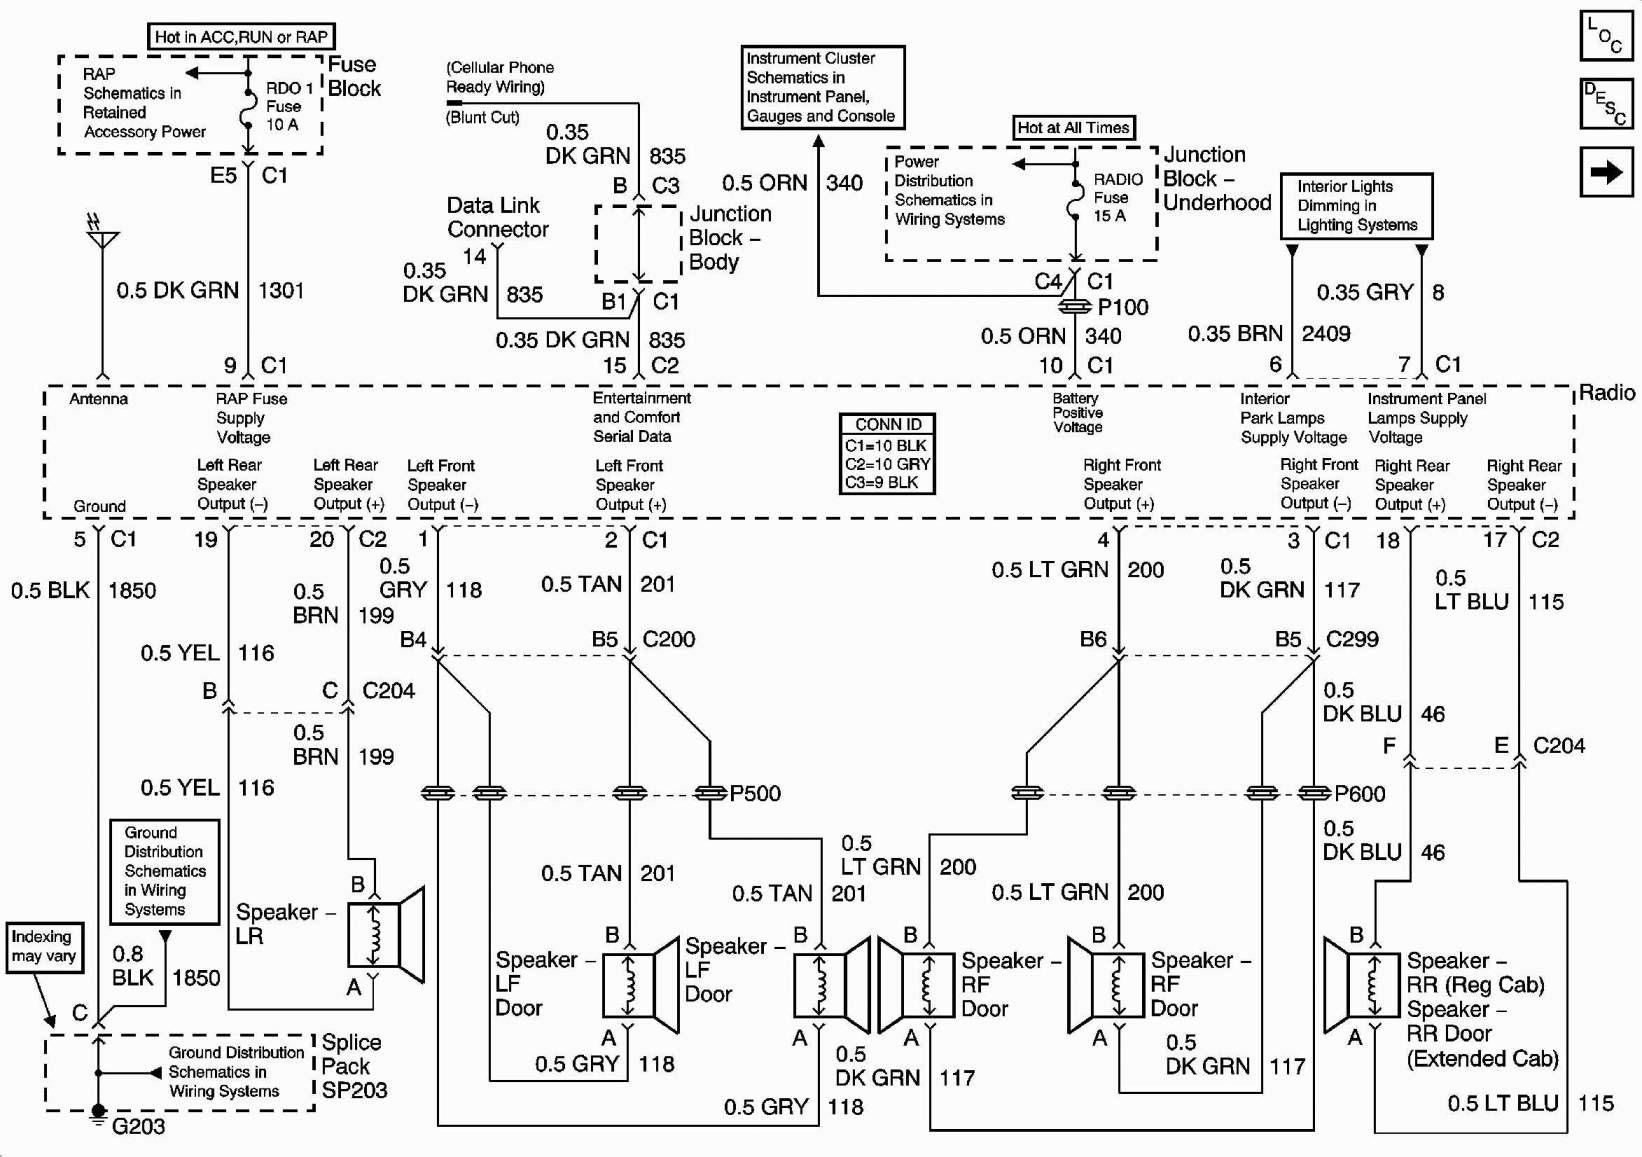 10 Chevy Tracker Wiring Diagram 2004 Chevy Silverado Chevy Silverado Chevy Silverado 1500